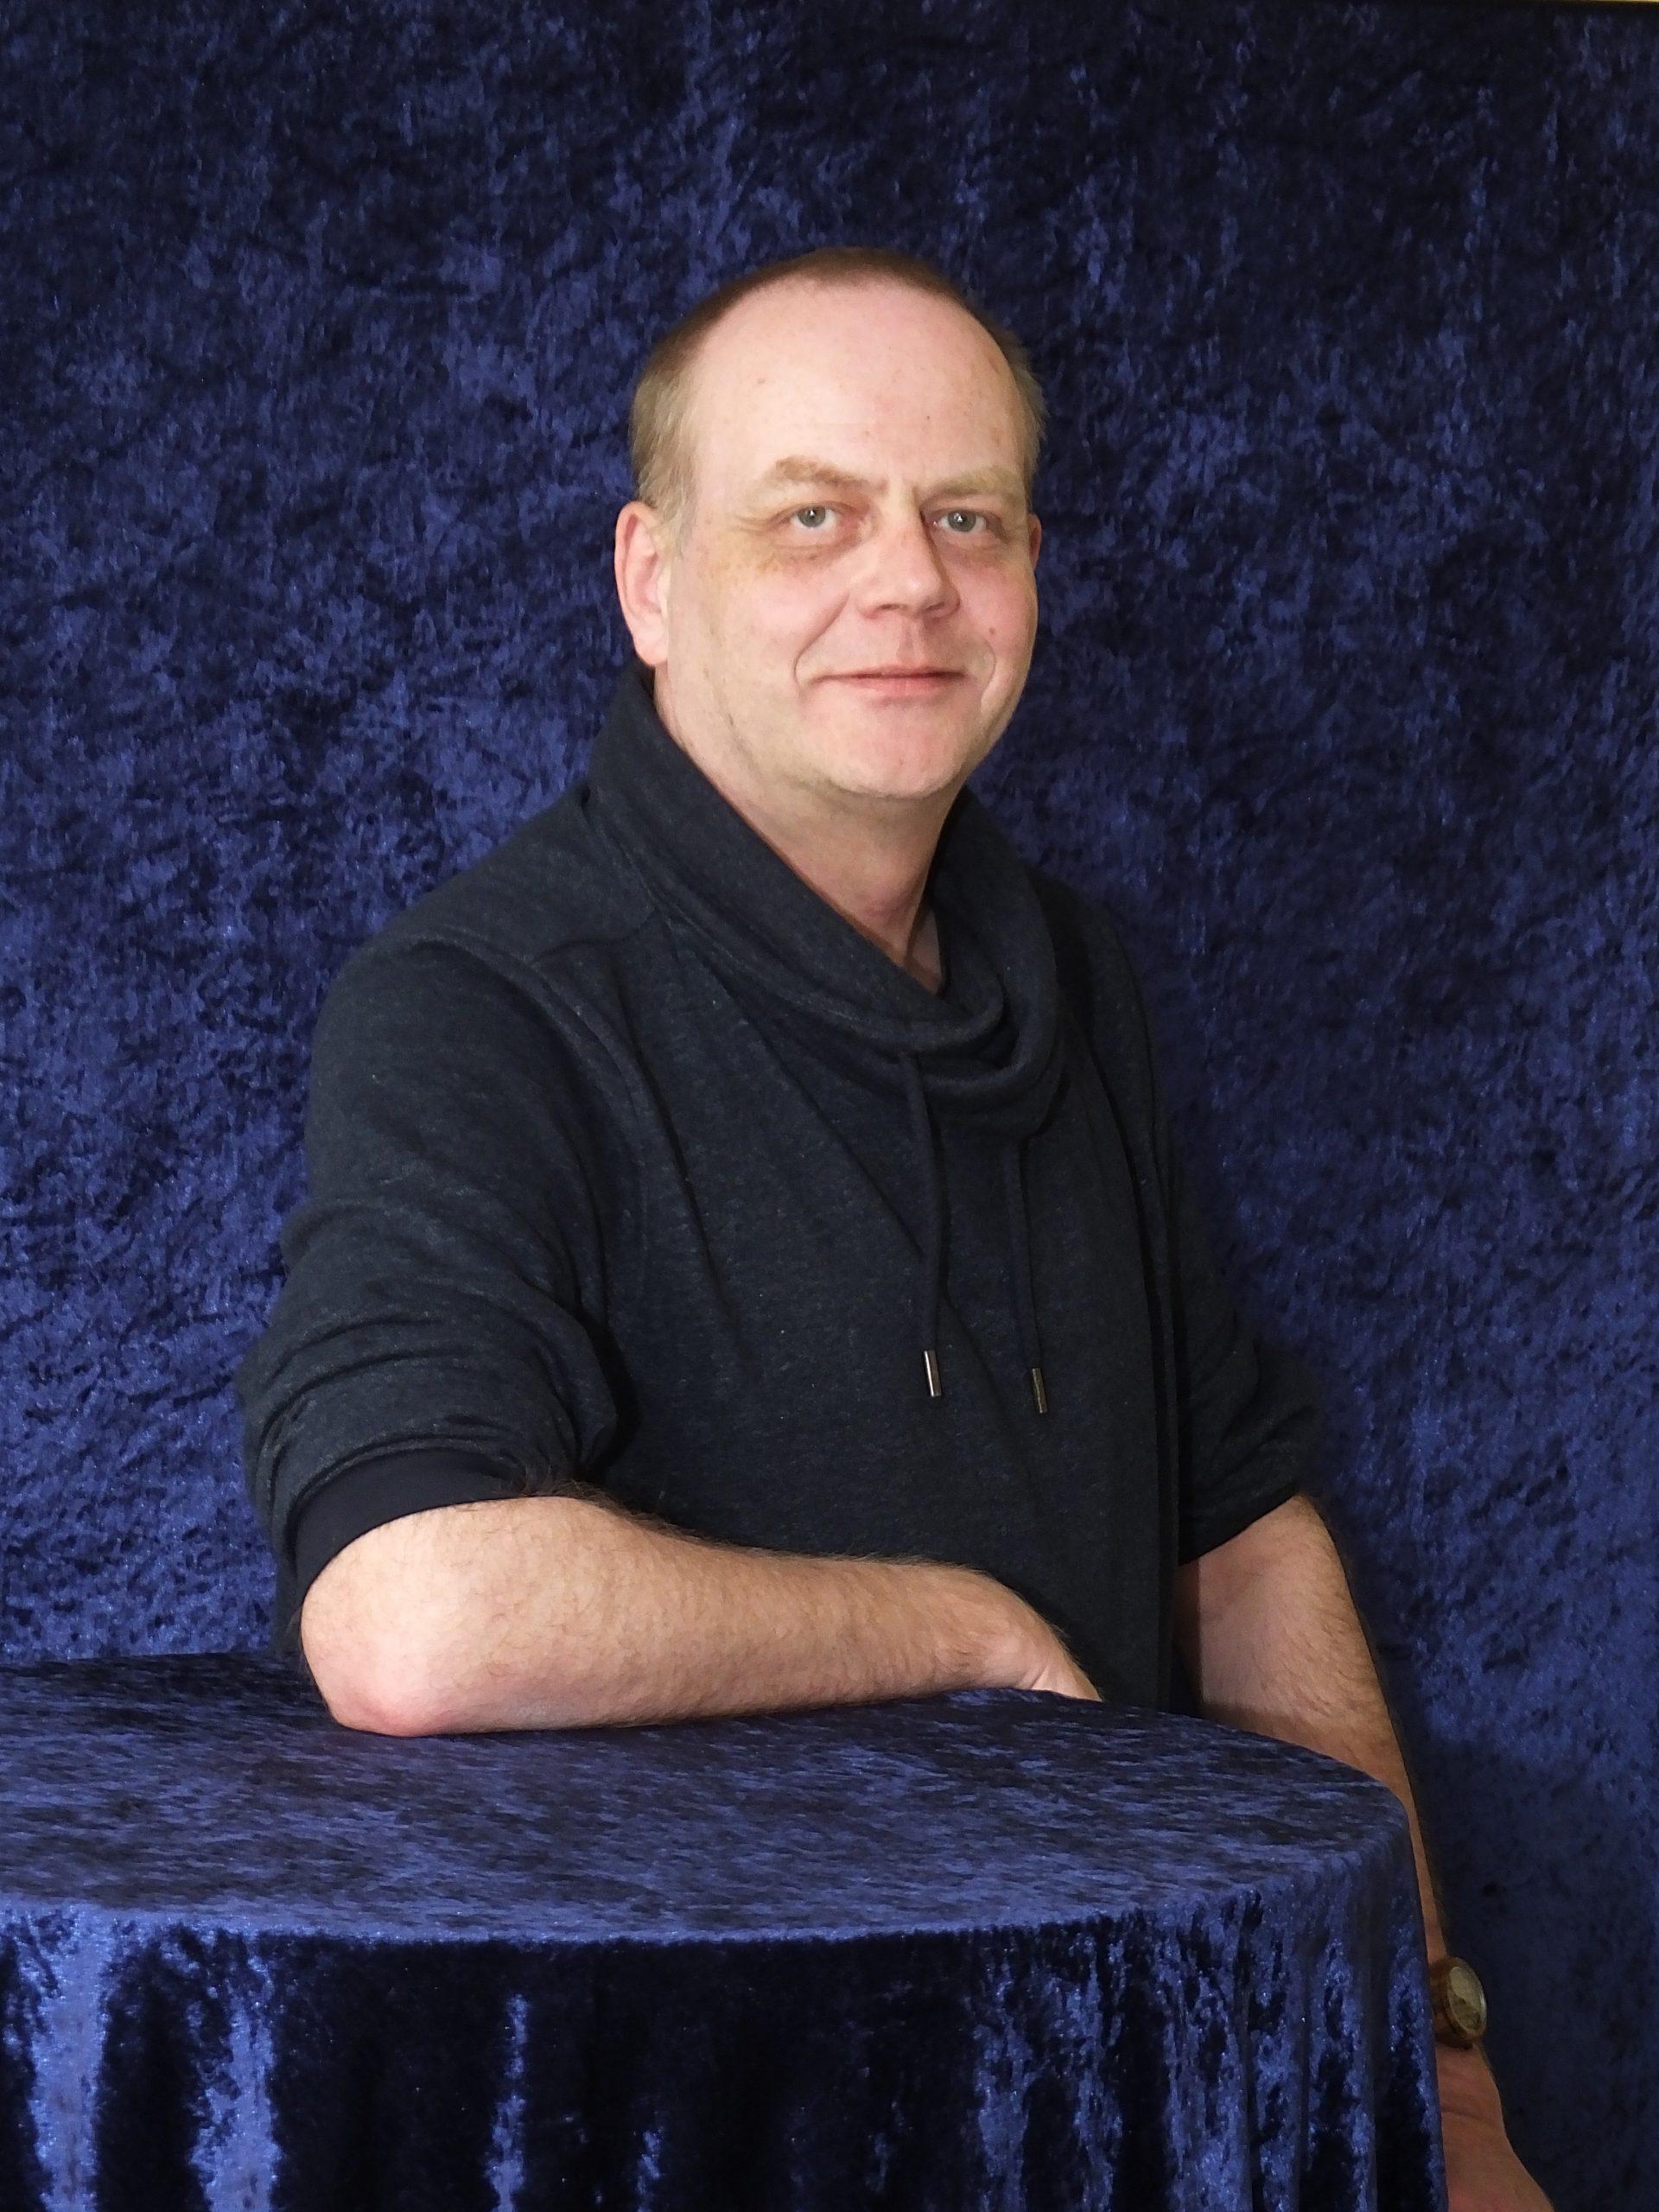 https://www.ulf-berner.de/wp-content/uploads/2021/01/Ulf-Berner_Presse_02_898x898.jpg